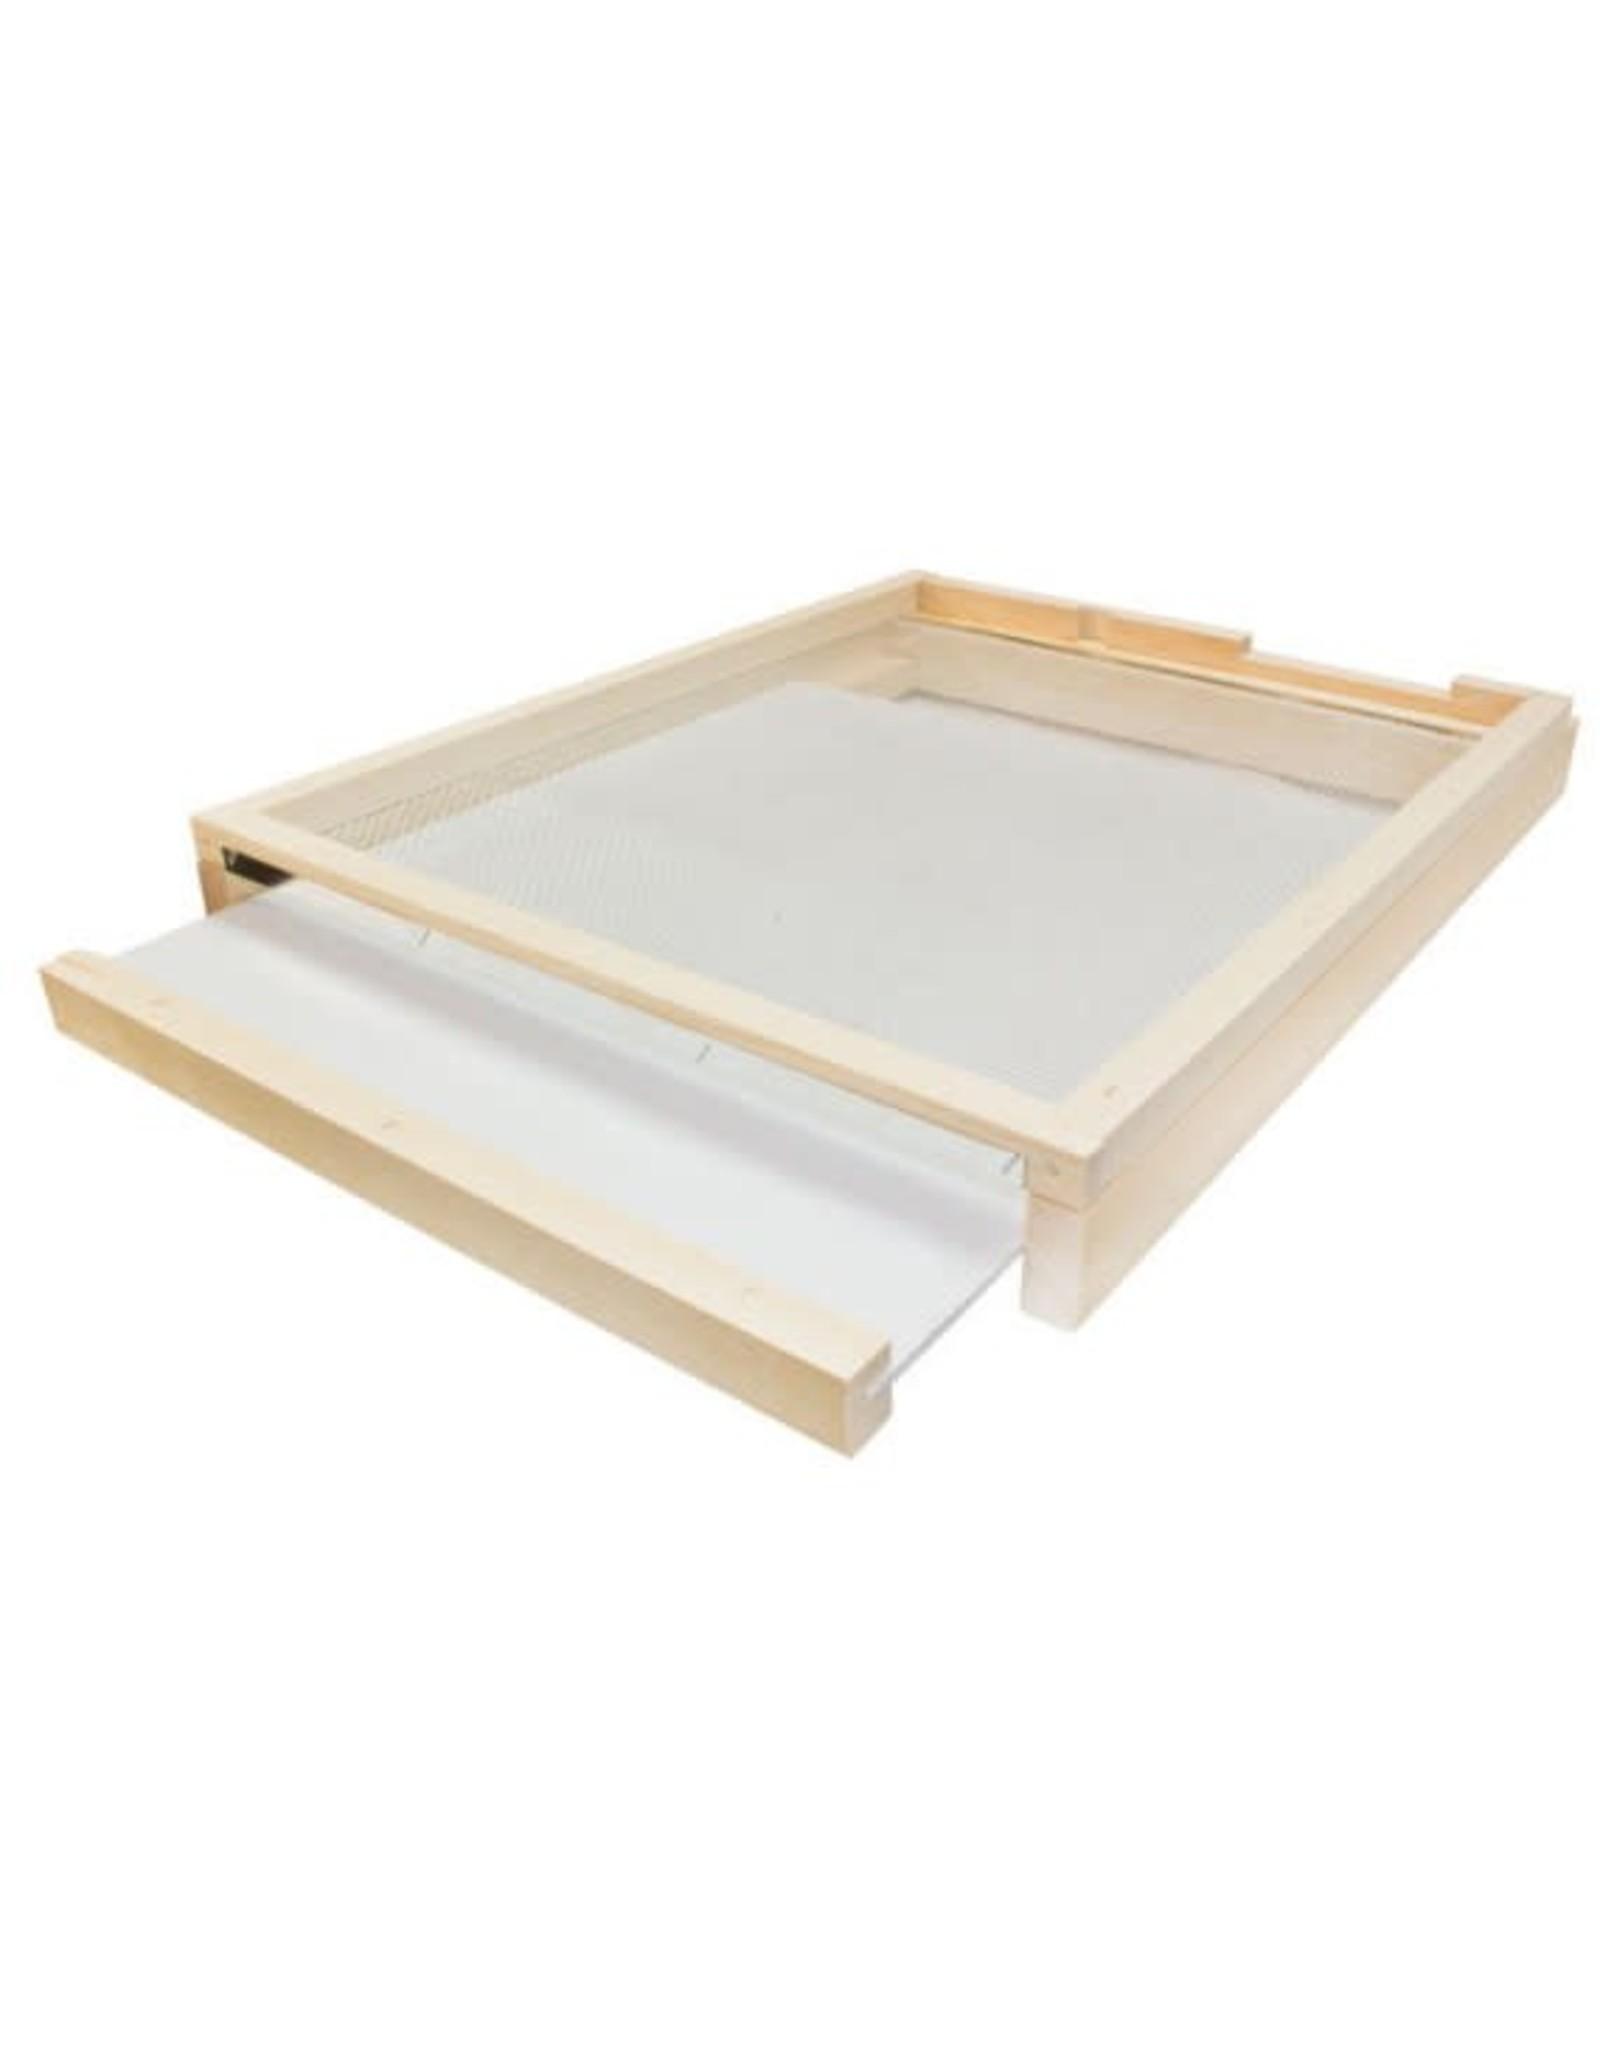 10 Frame Bottom Board Varroa Trap